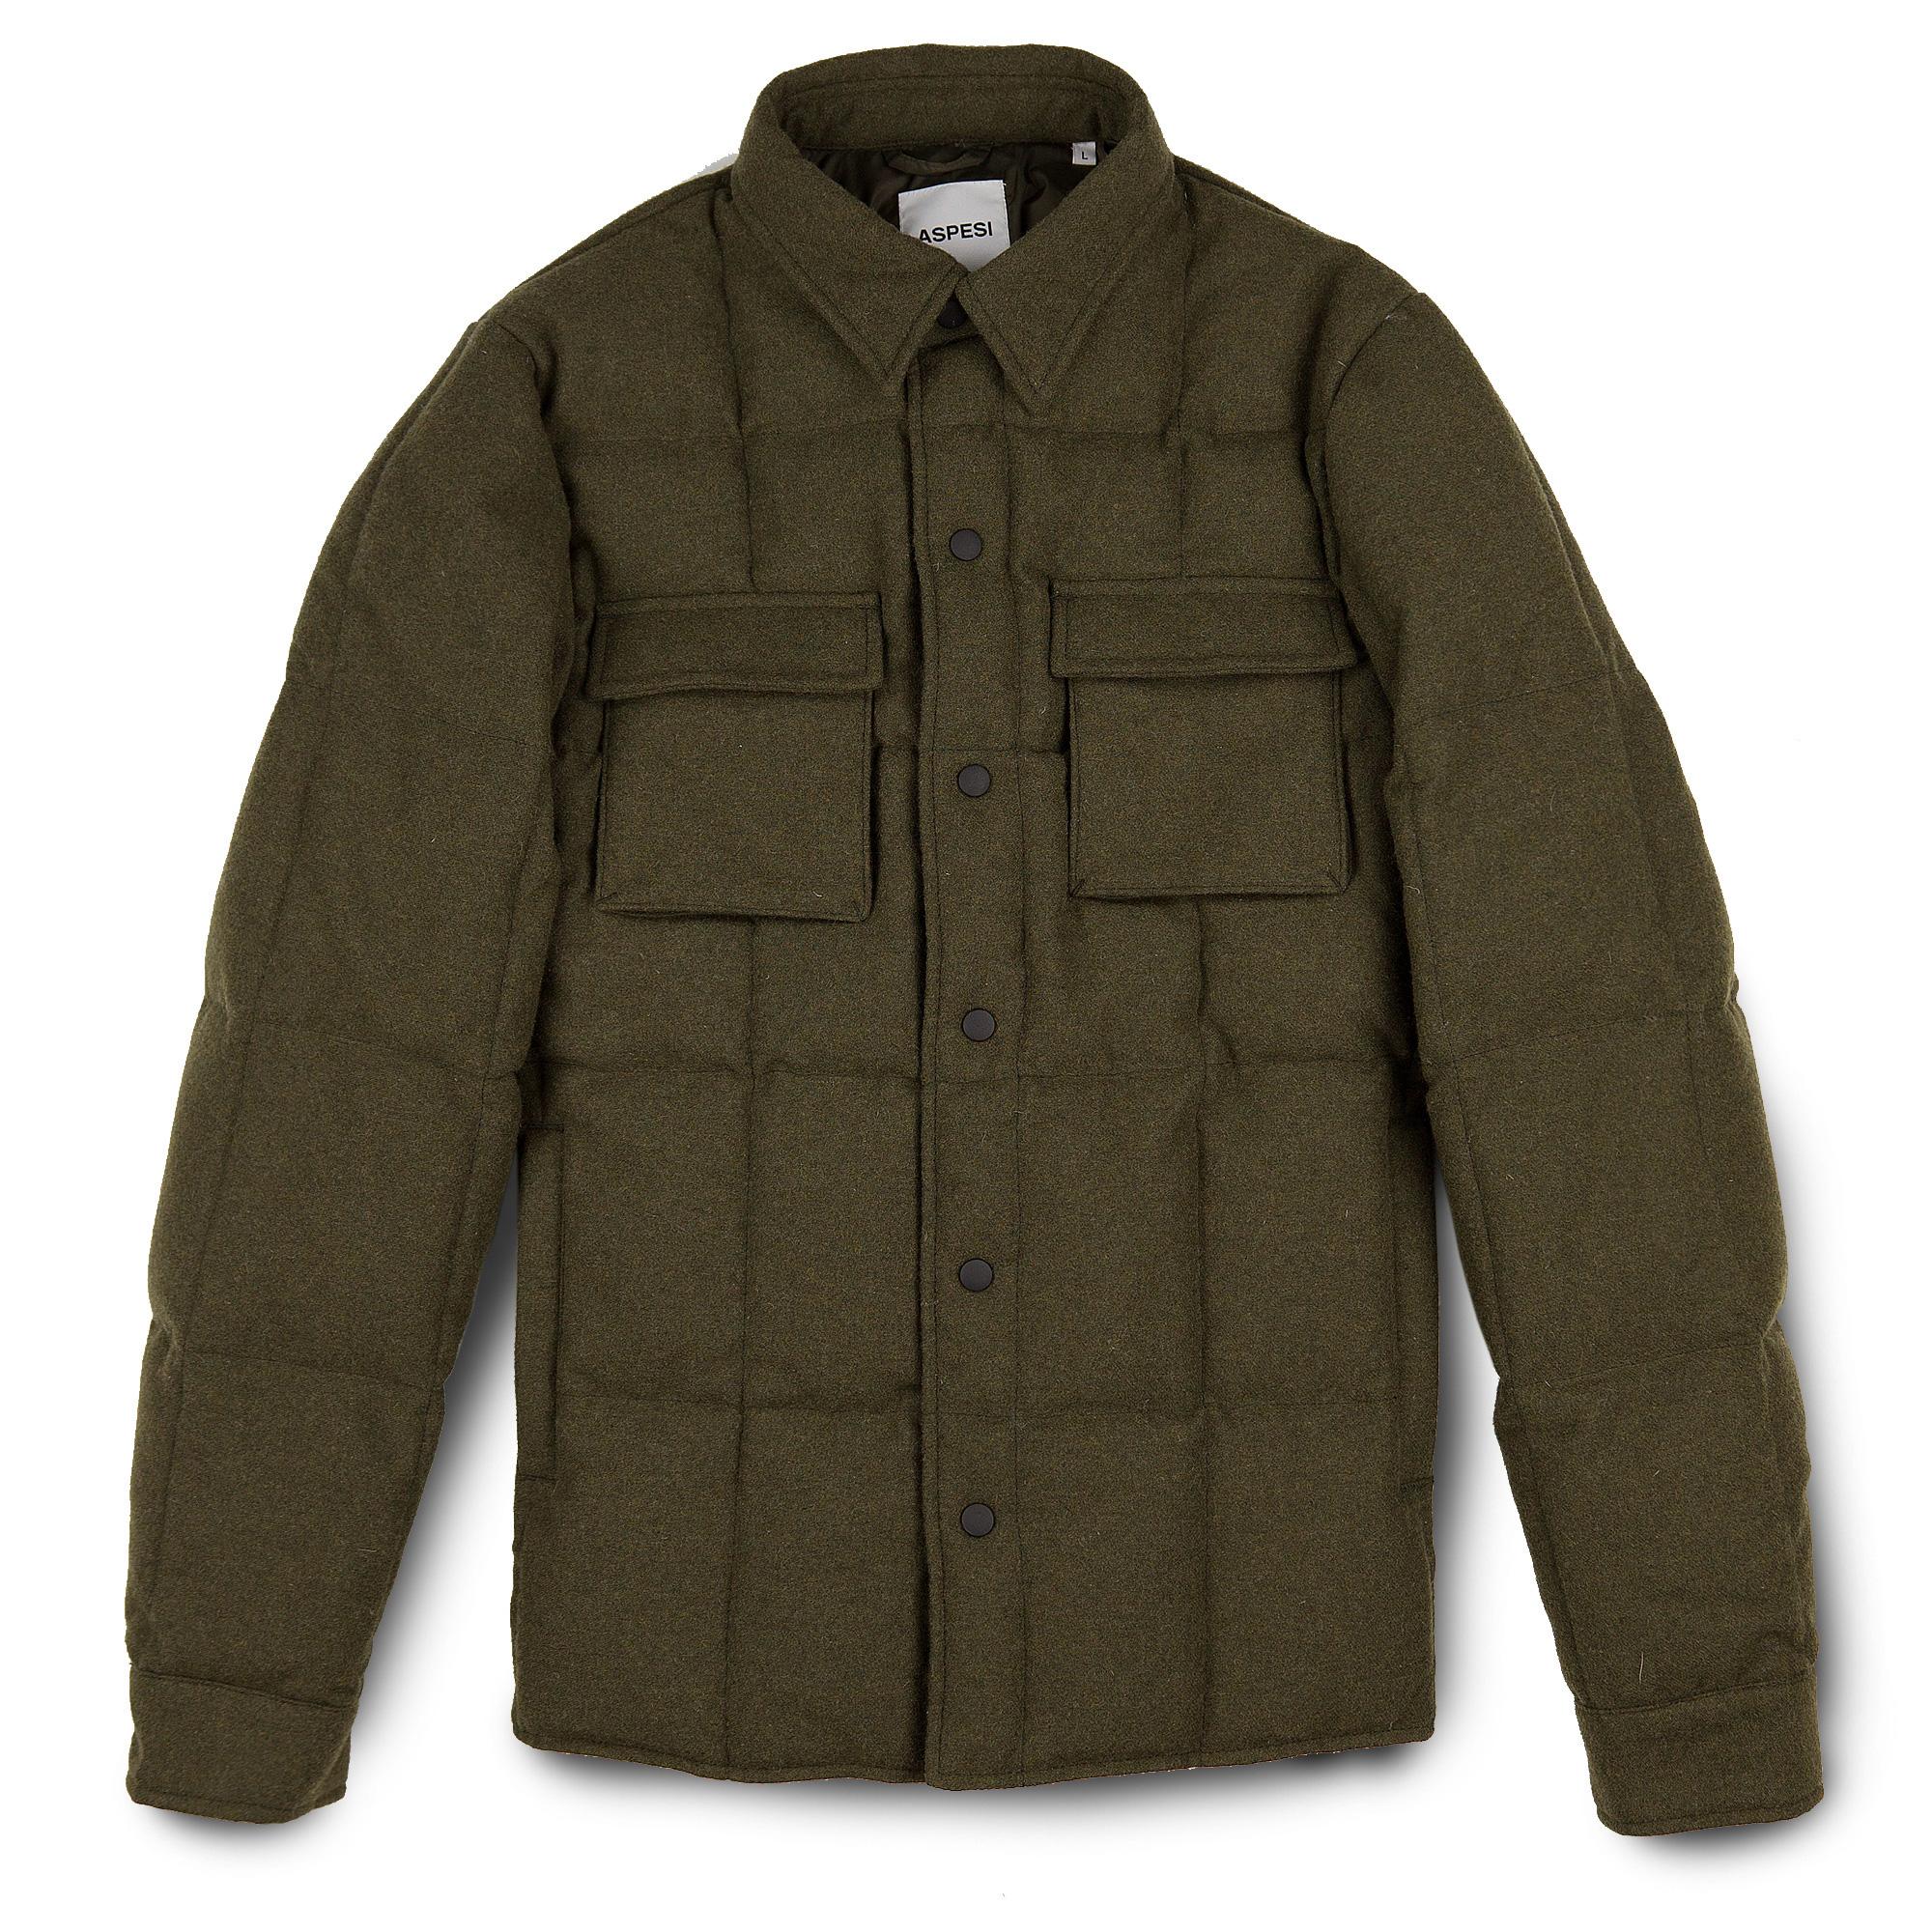 aspesi-grey-wool-checker-jacket-product-1-4900931-621337081.jpeg